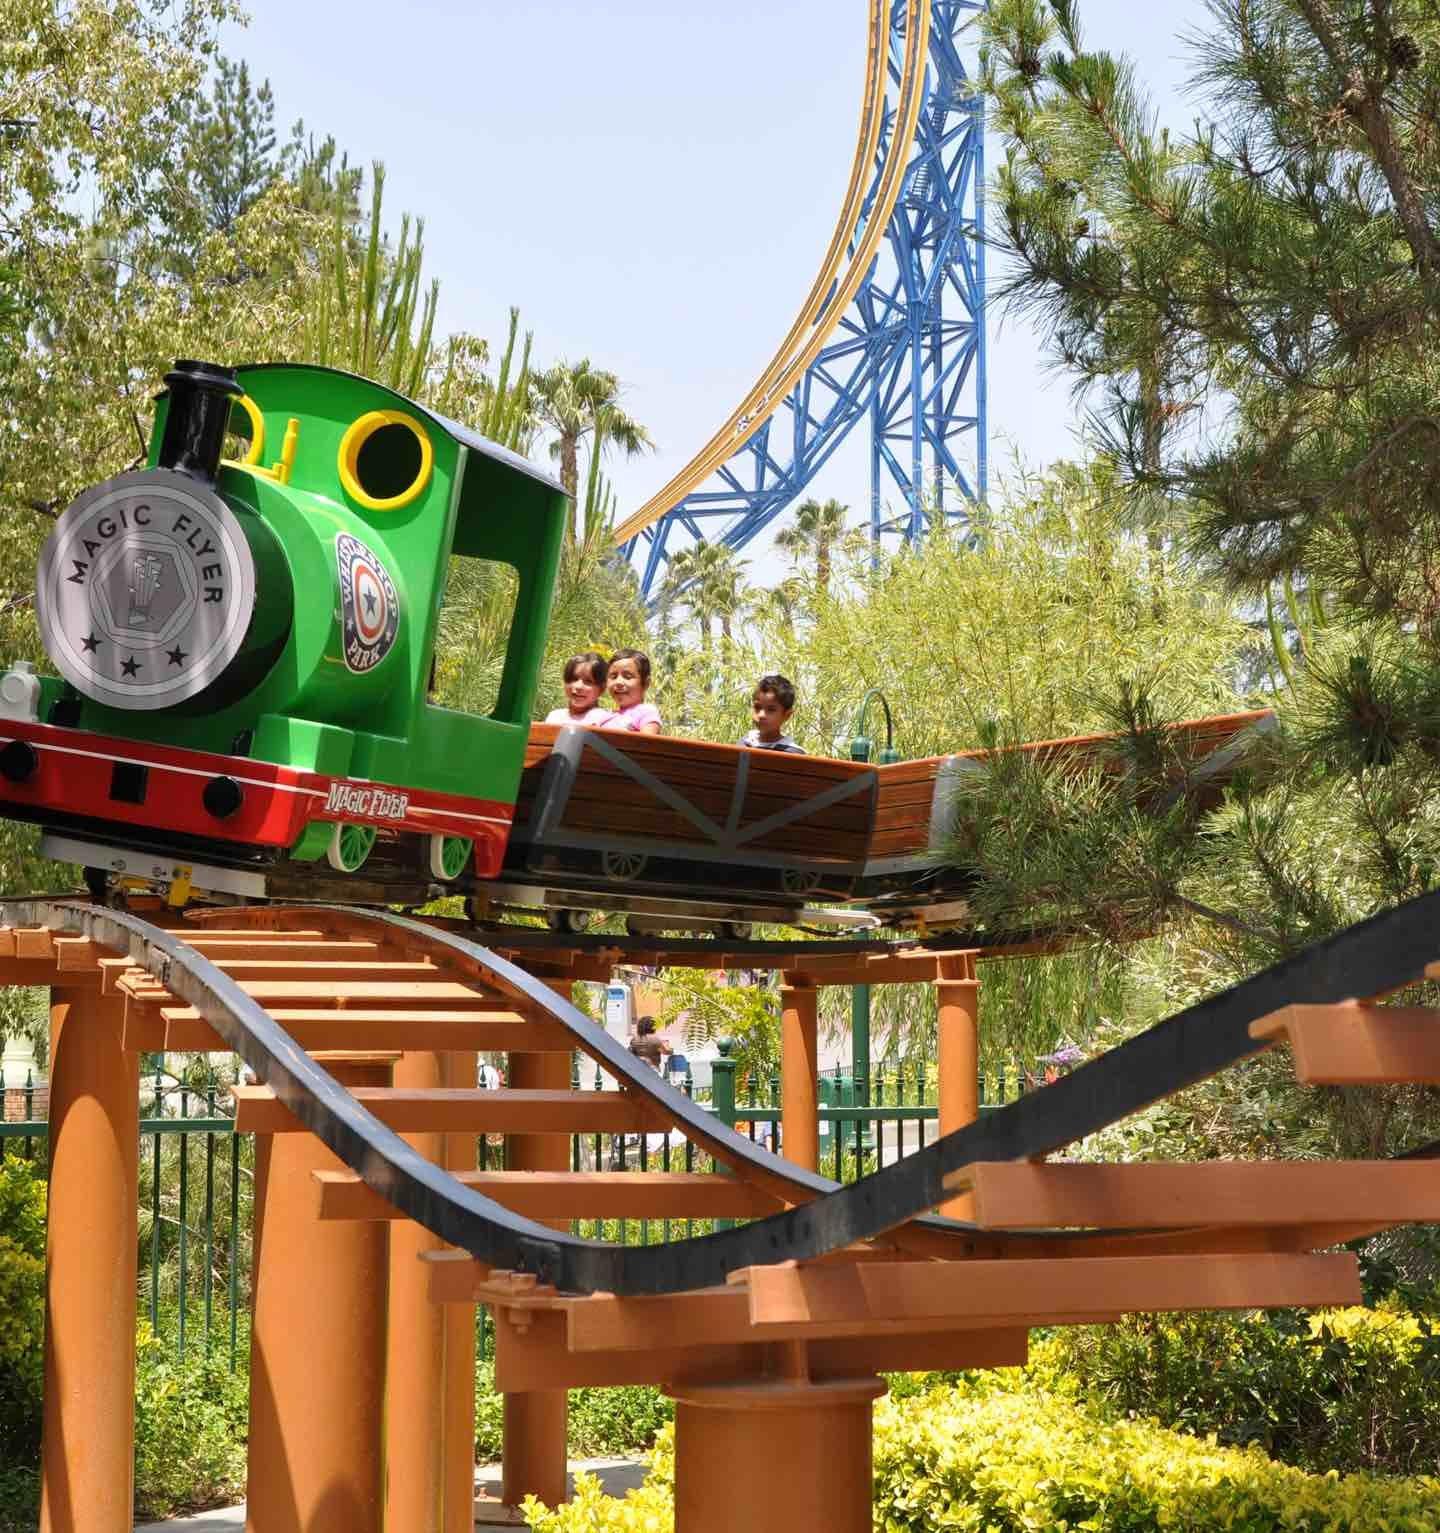 Magic Flyer Six Flags Magic Mountain